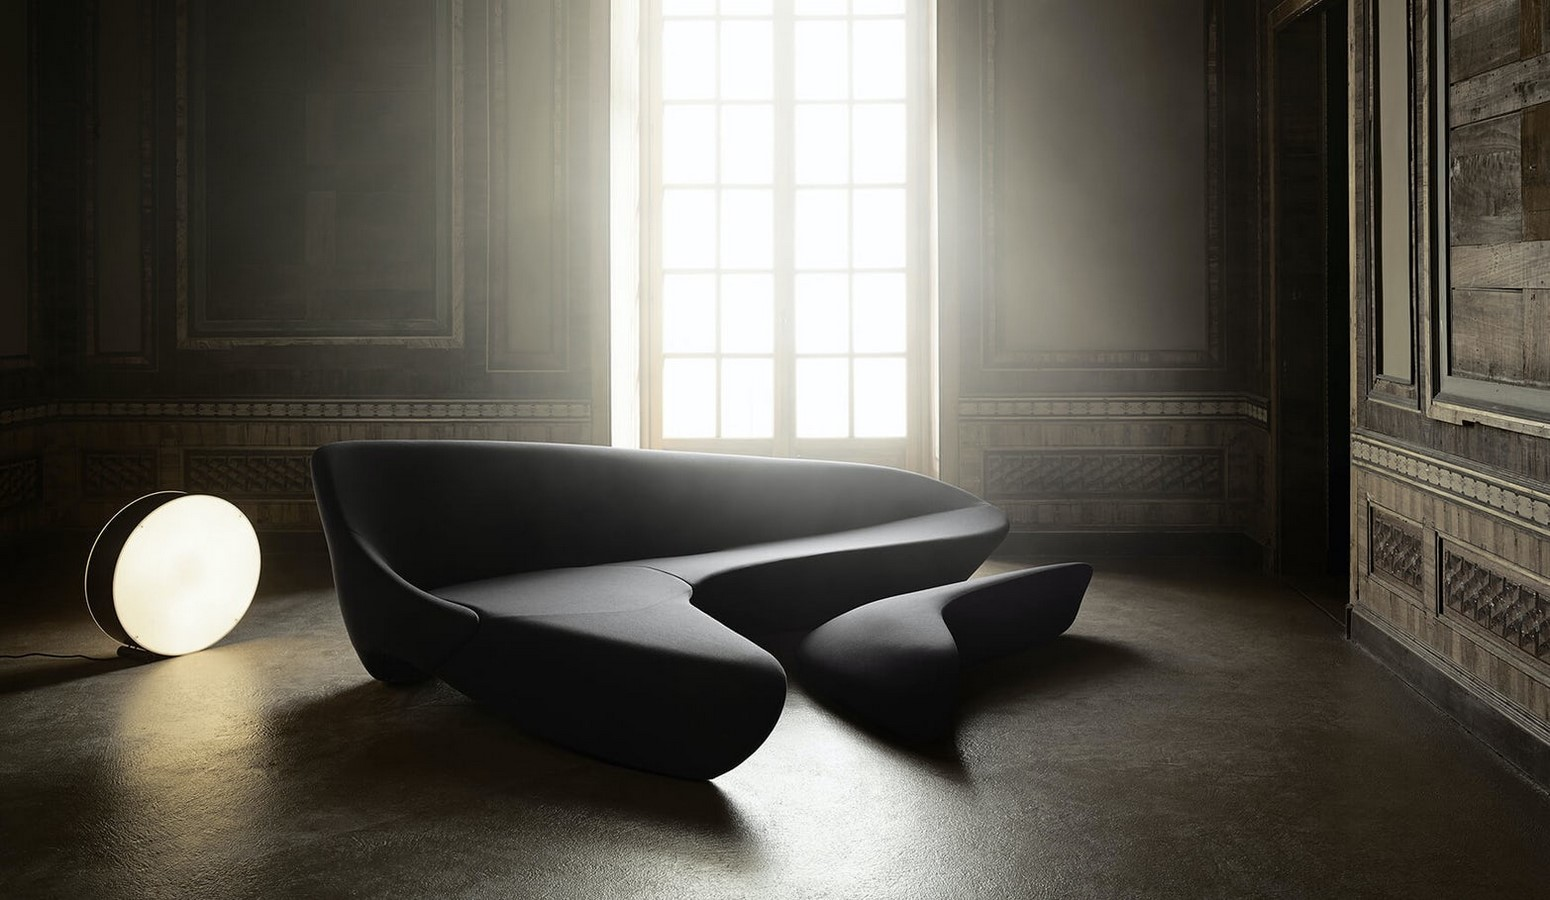 Moon System Sofa (2007)